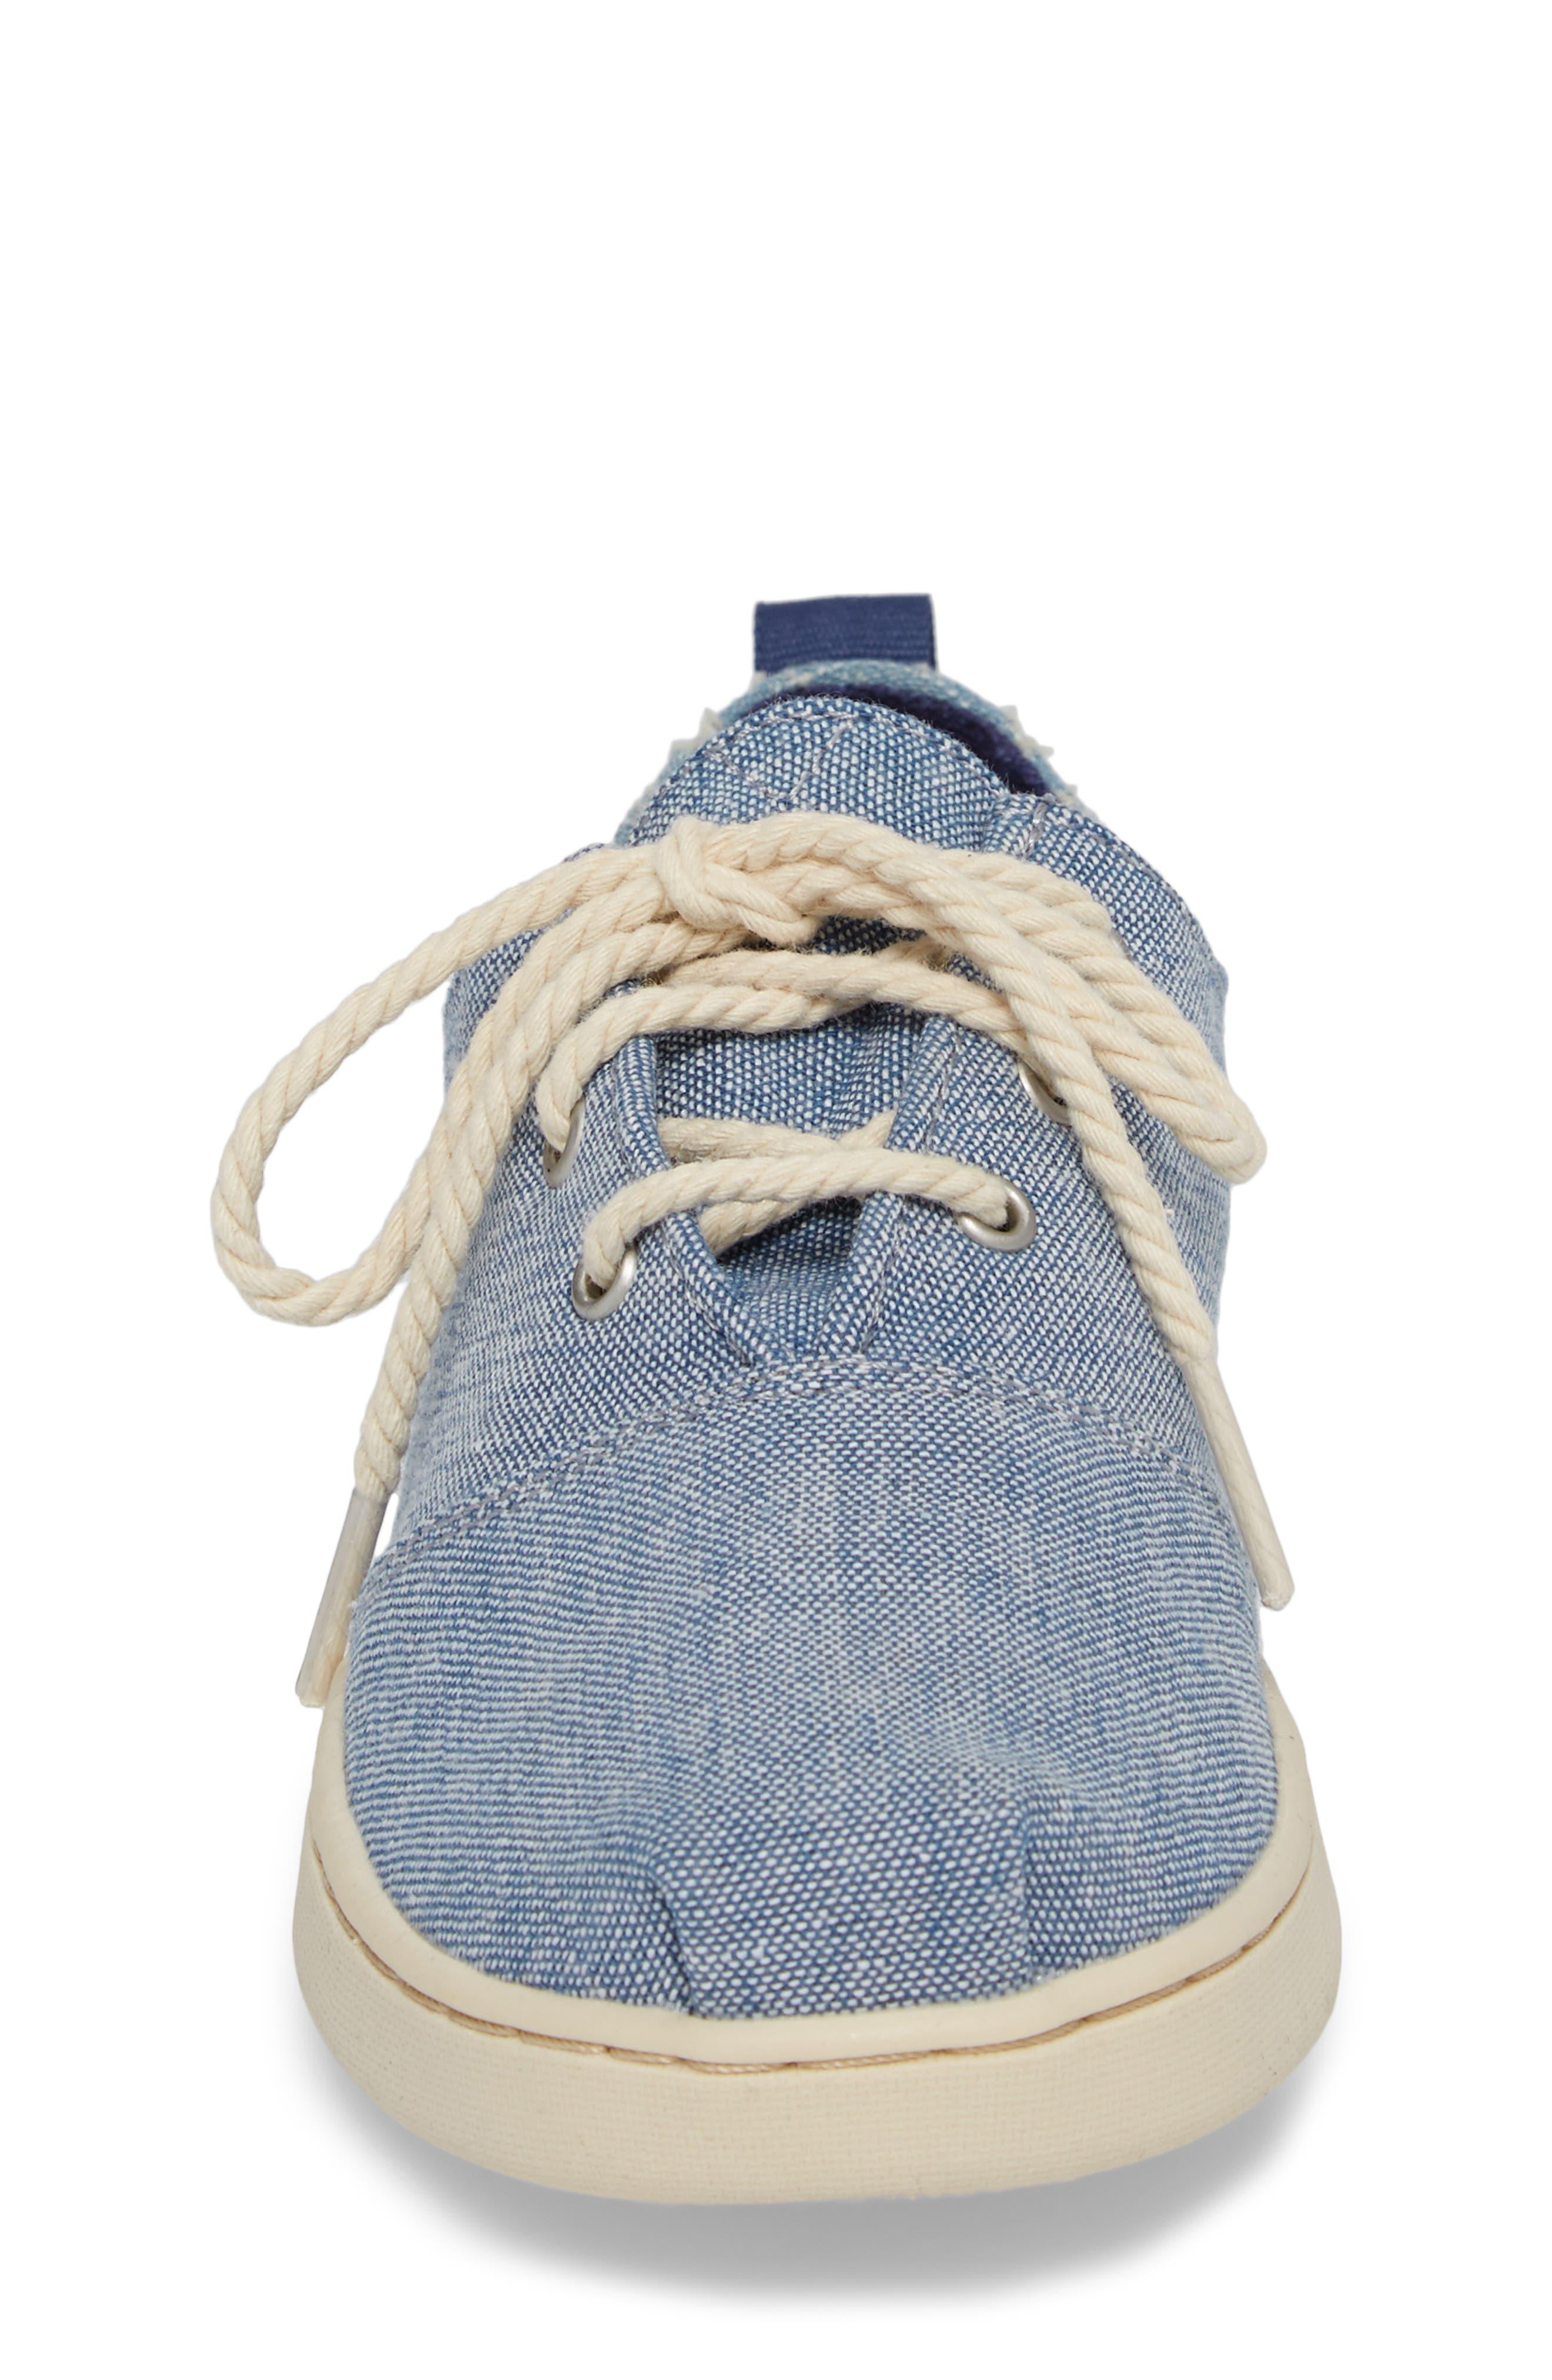 Lumin Sneaker,                             Alternate thumbnail 4, color,                             Blue Chambray